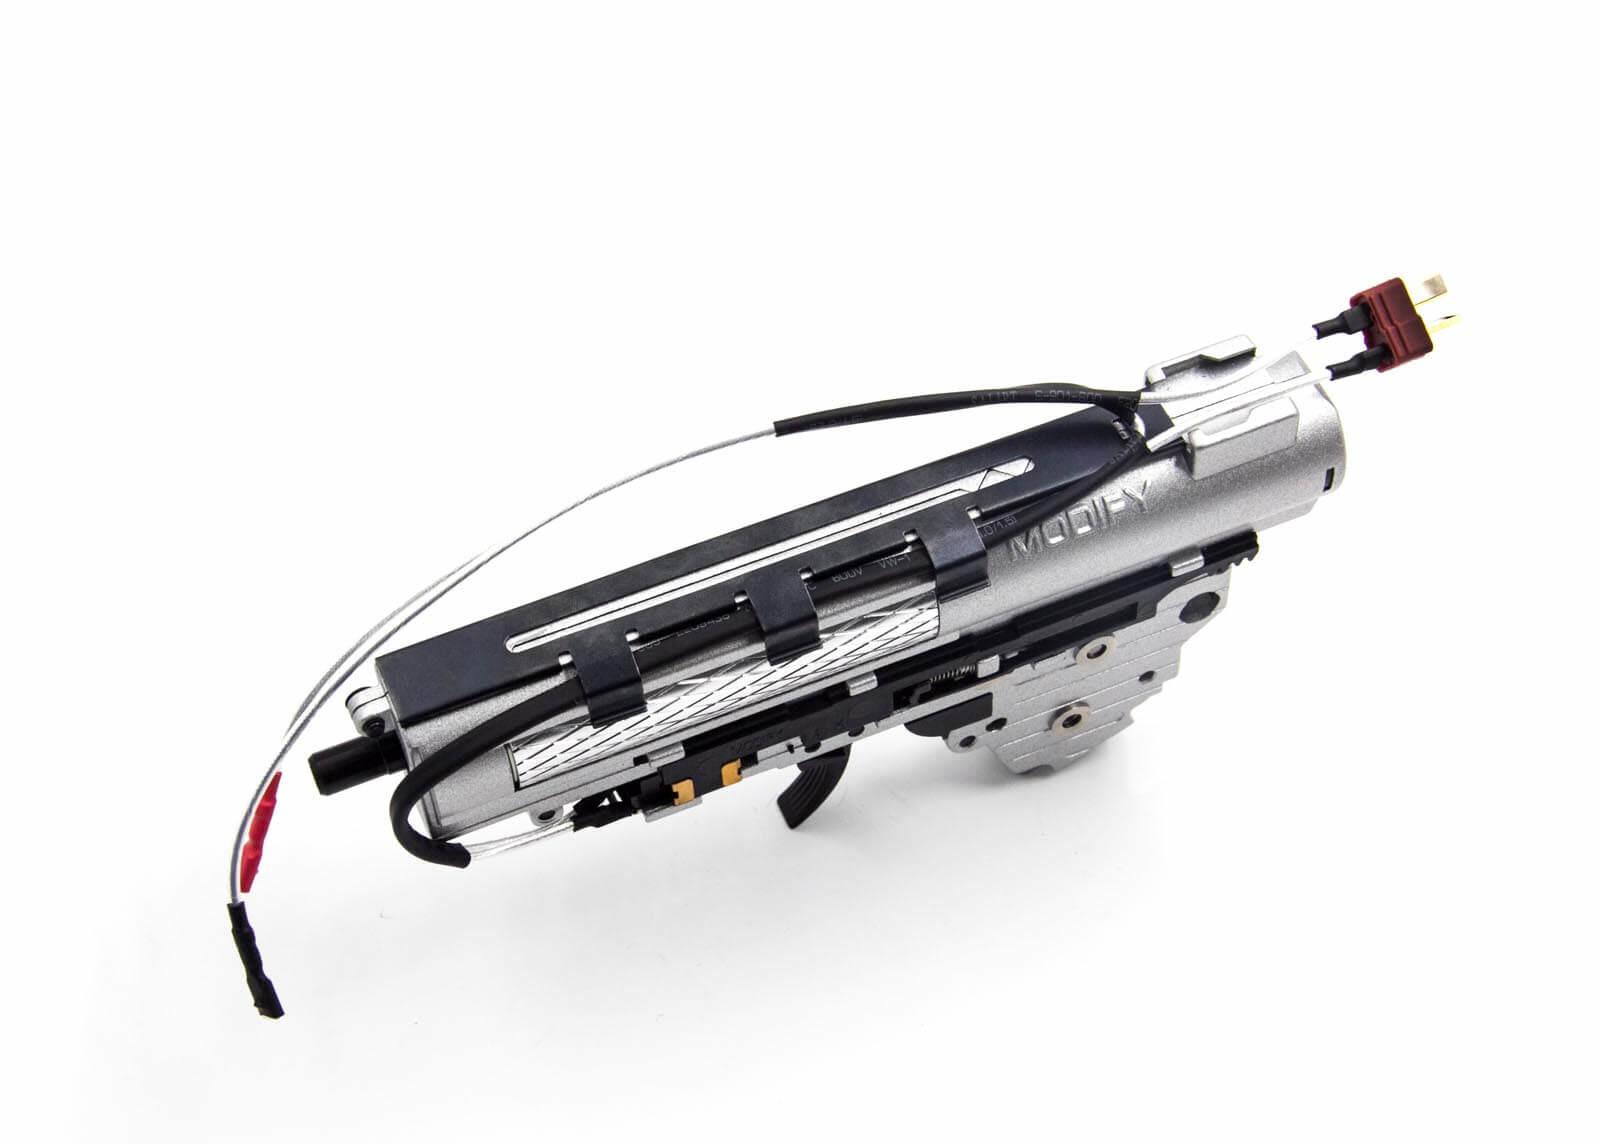 Modify AK47S Torus Gearbox Set Torque Type S120+, 8mm - front